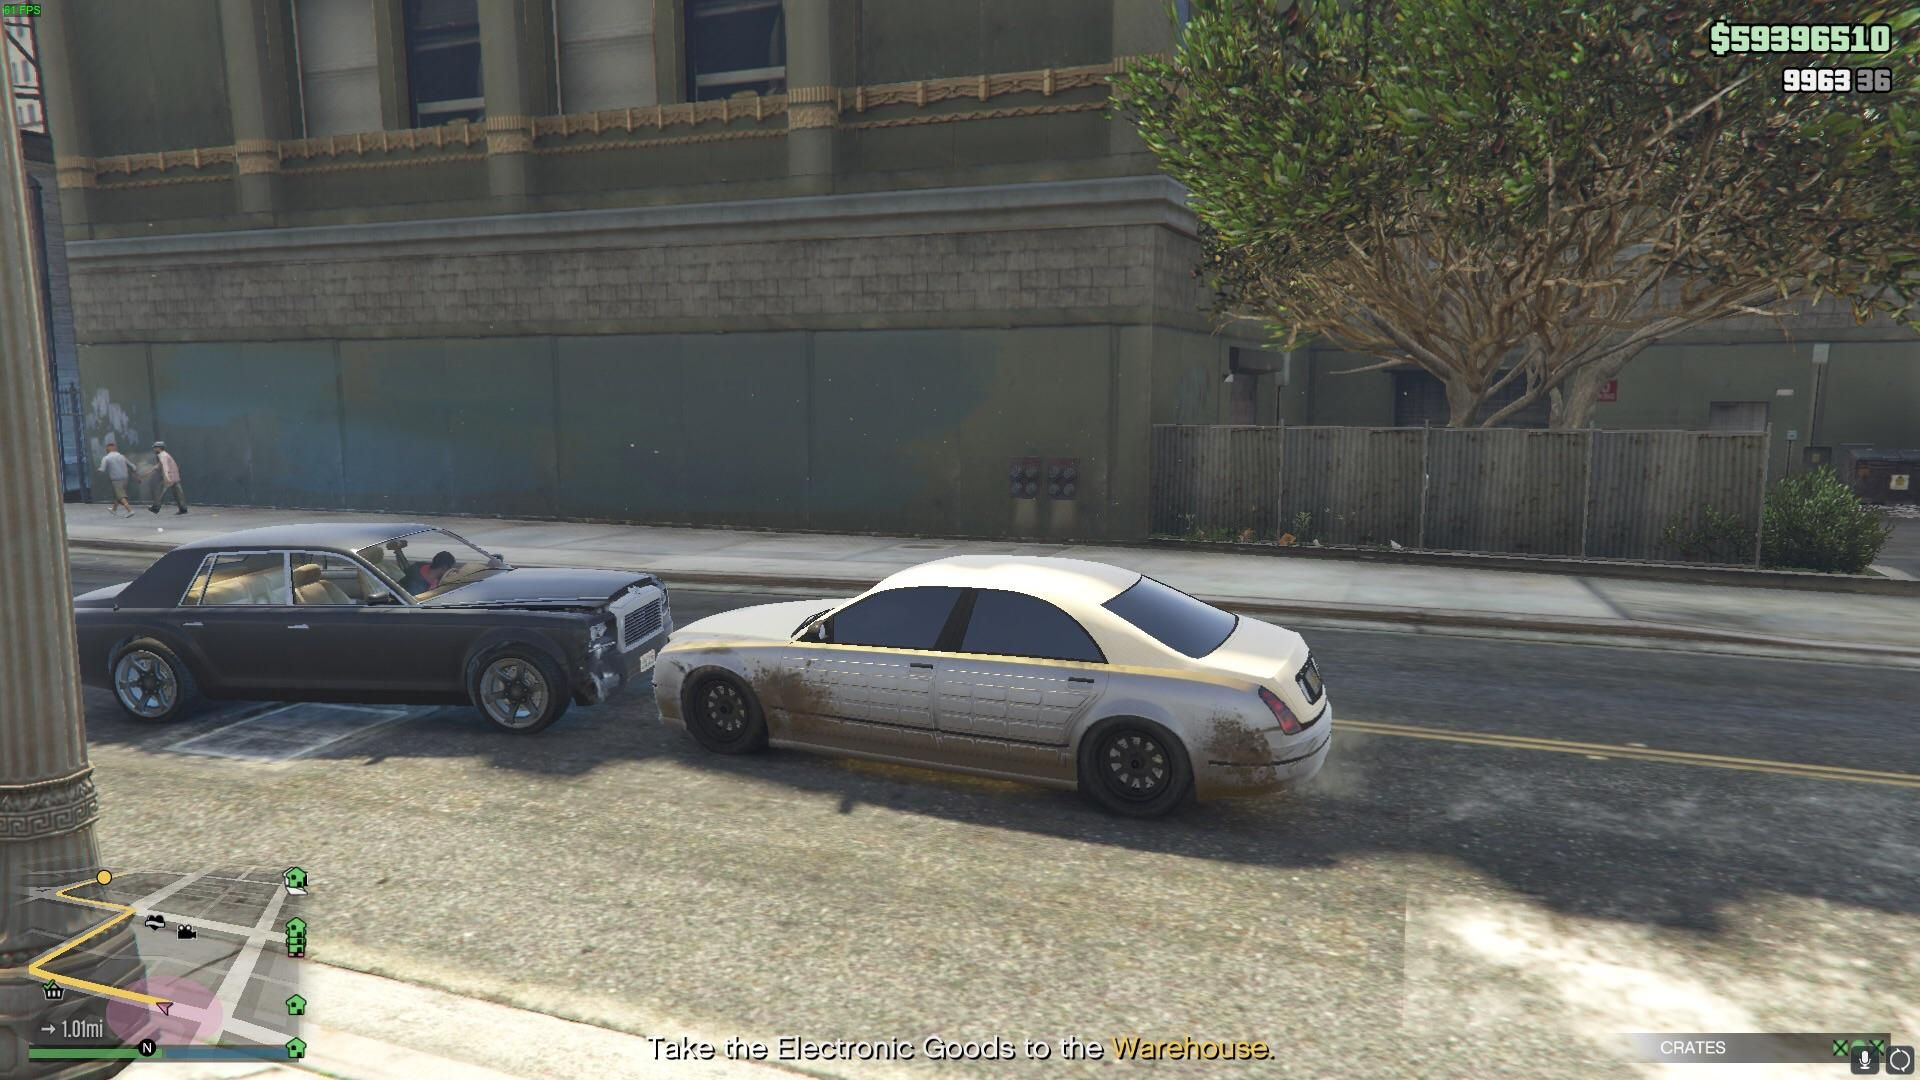 Bentley vs. Rolls-Royce. #GrandTheftAutoV #GTAV #GTA5 #GrandTheftAuto #GTA #GTAOnline #GrandTheftAuto5 #PS4 #games